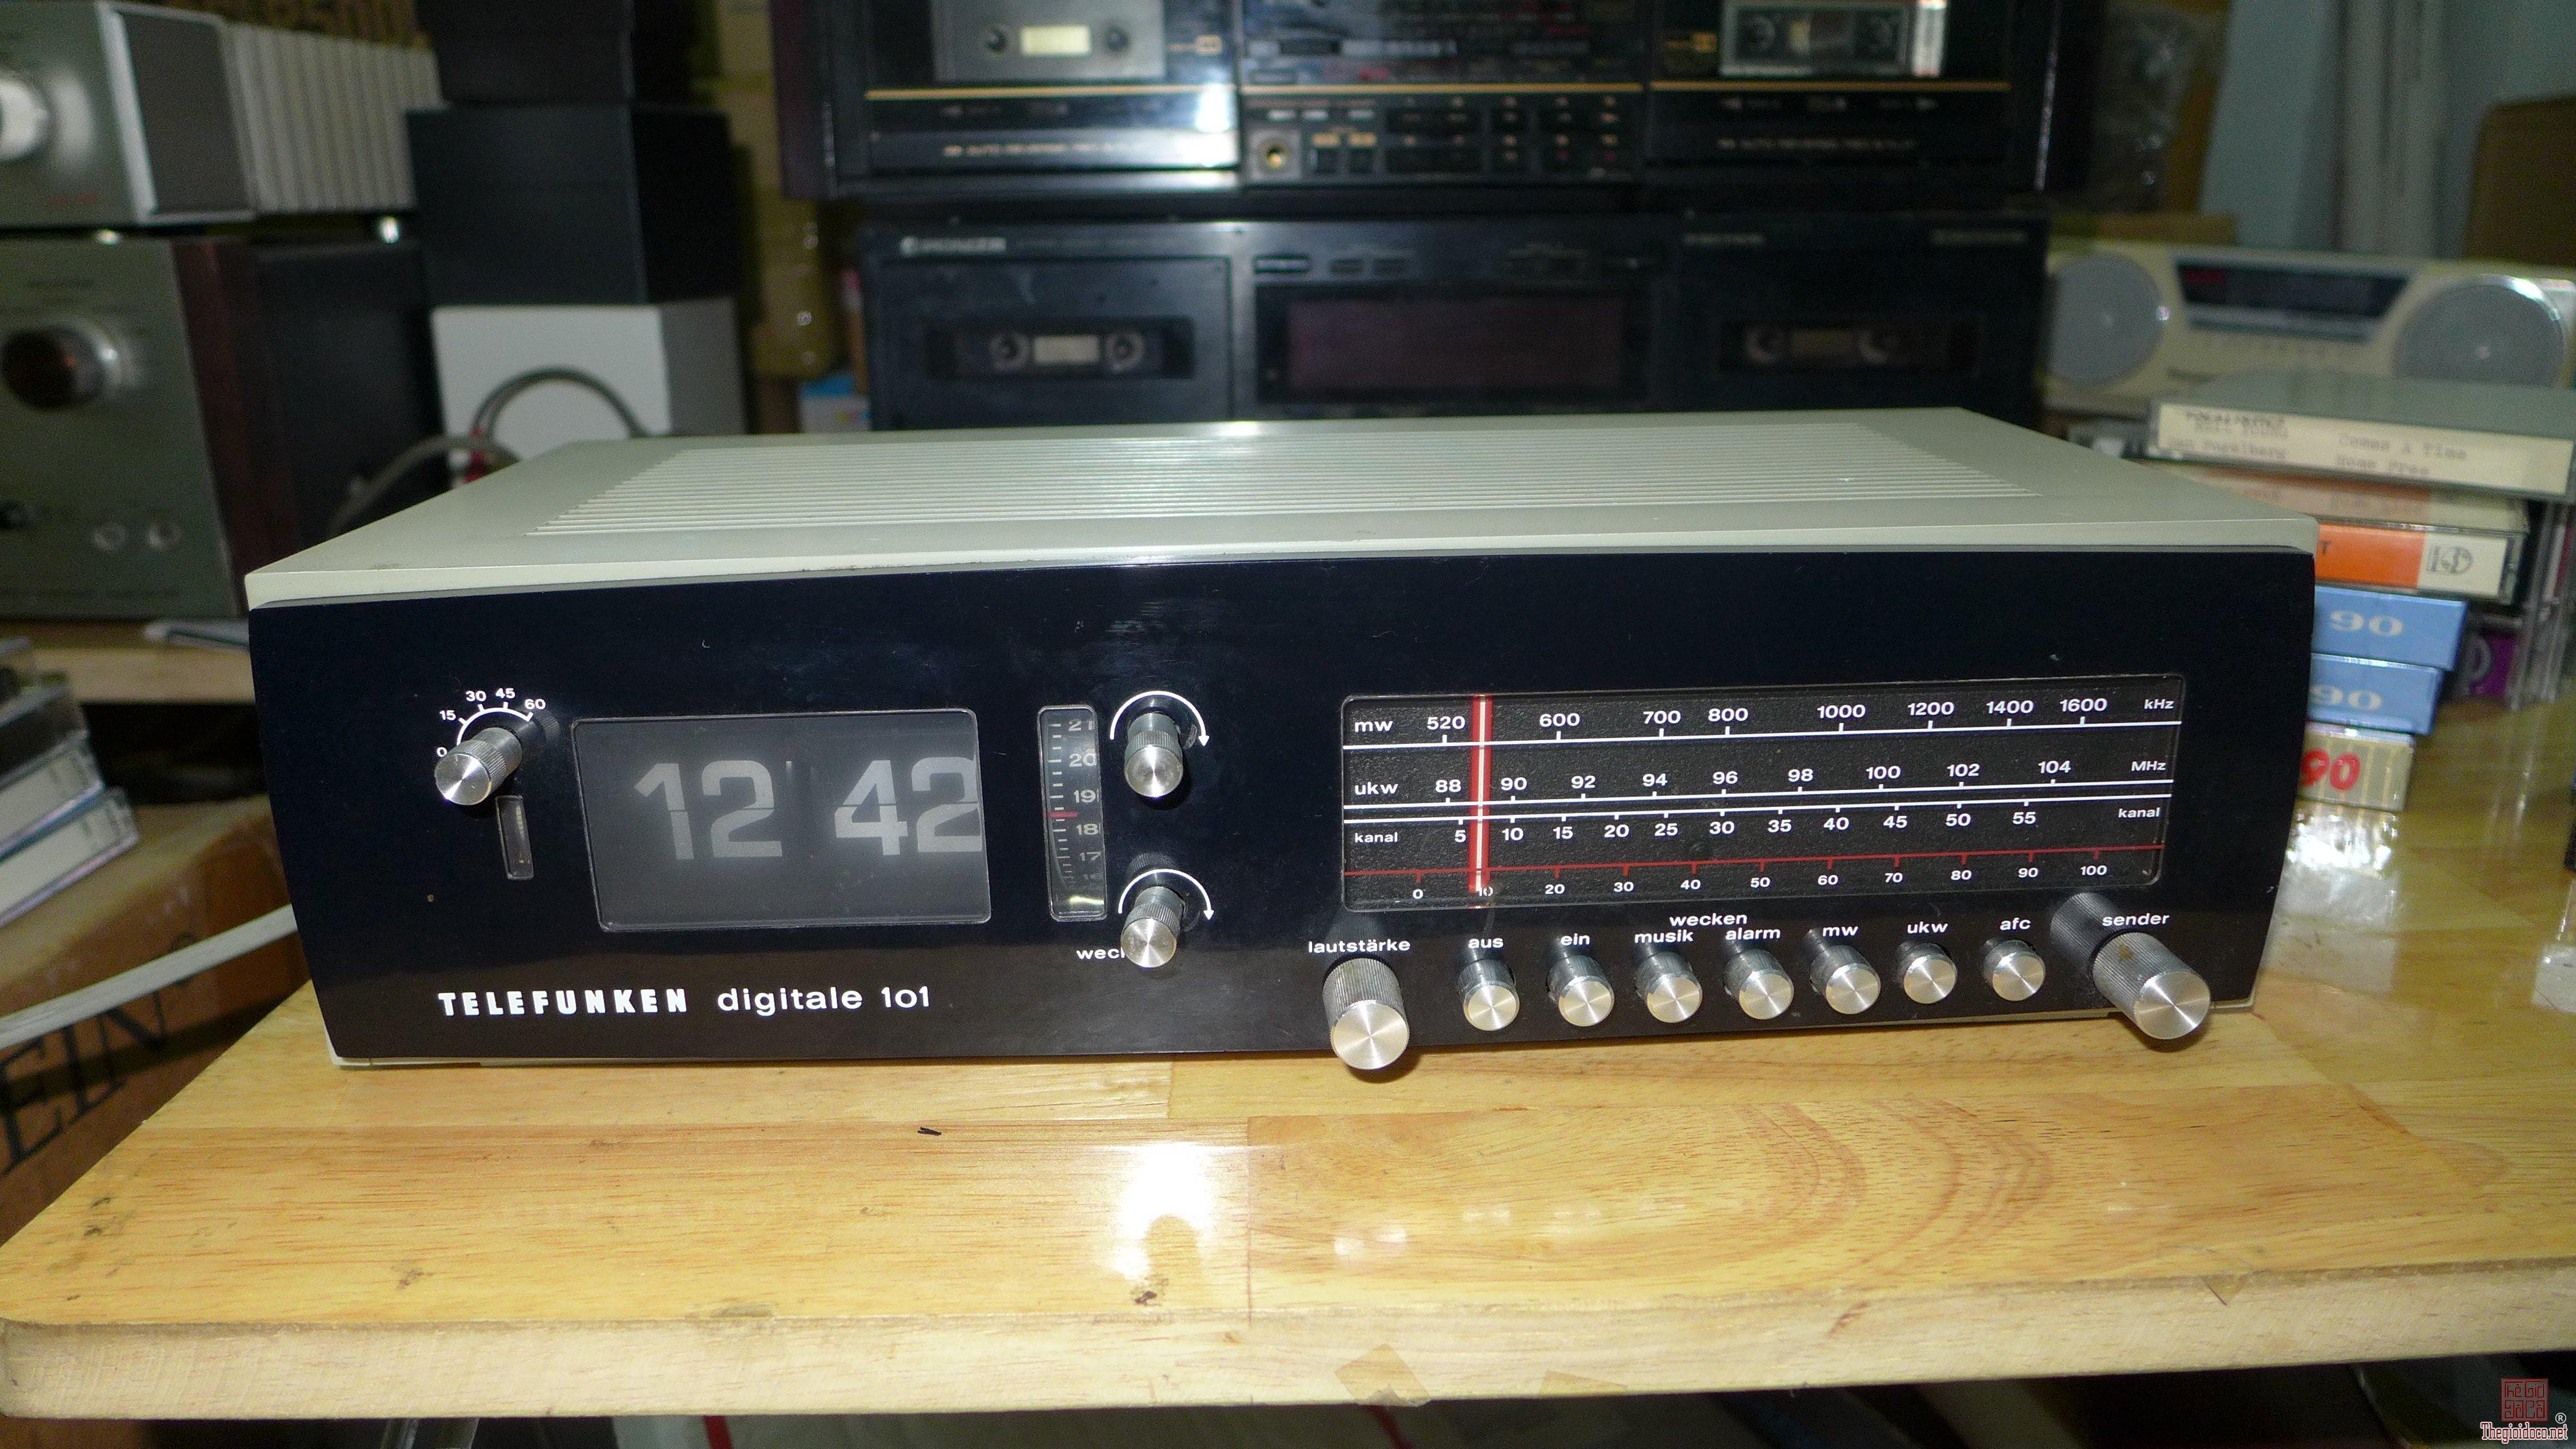 HCM - Q10 - Bán radio Telefunken Digitale 101.